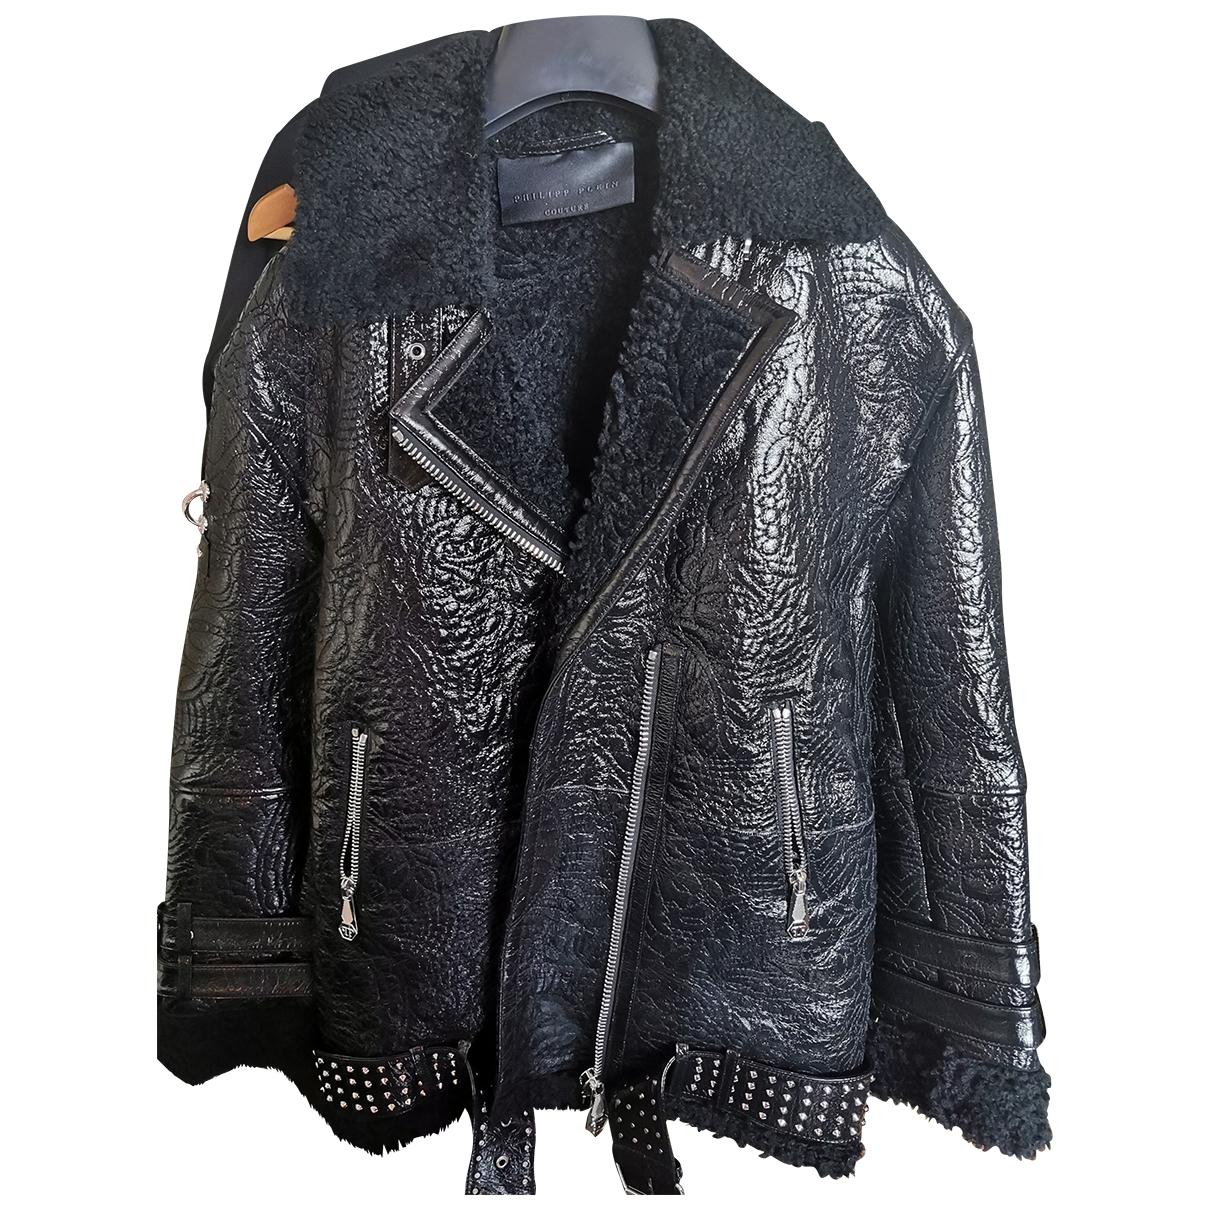 Philipp Plein \N Black Shearling coat  for Men L International